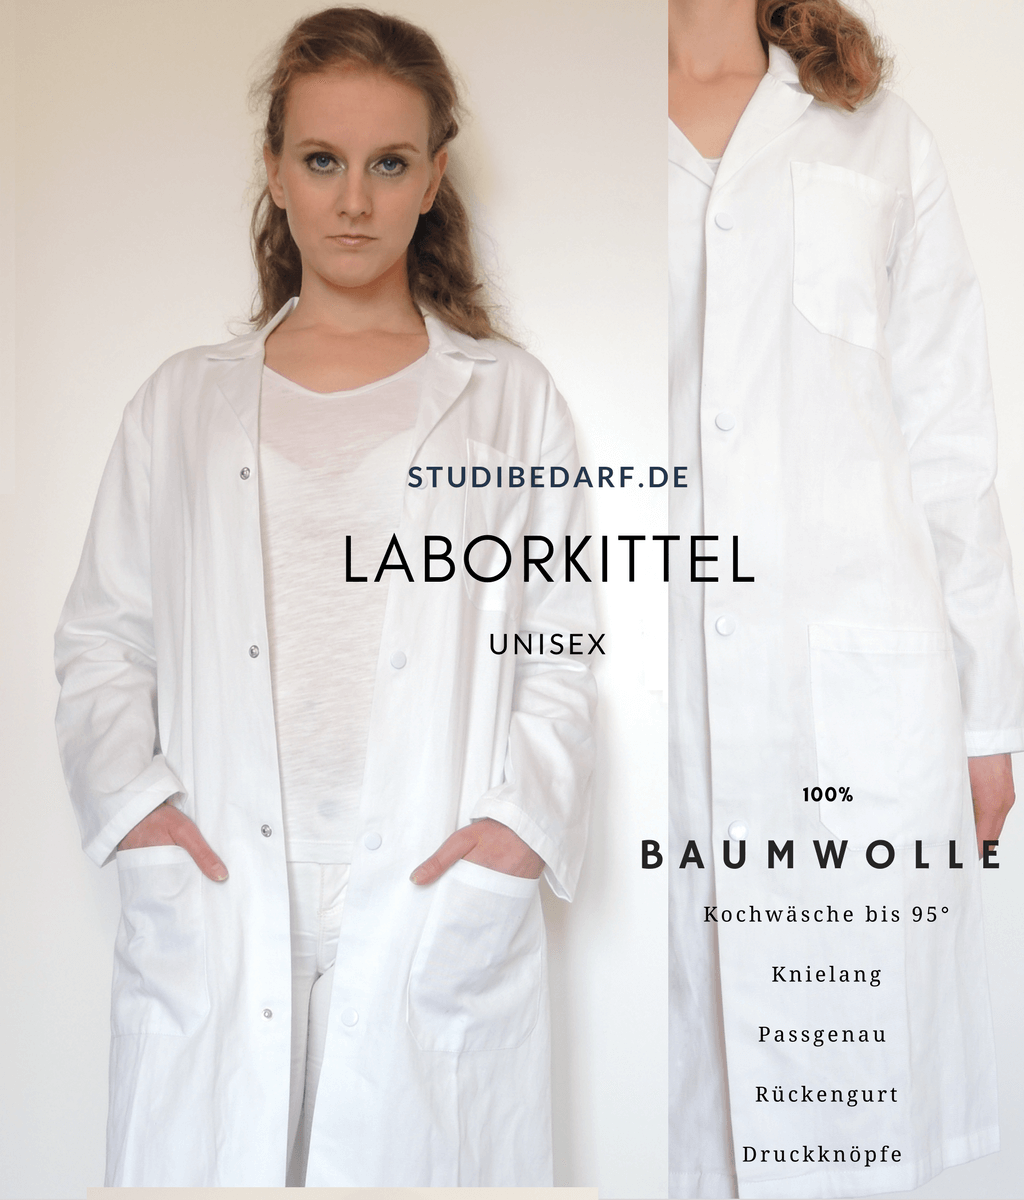 Studibedarf-Laborkittel-Baumwolle-Unisex-Günstig